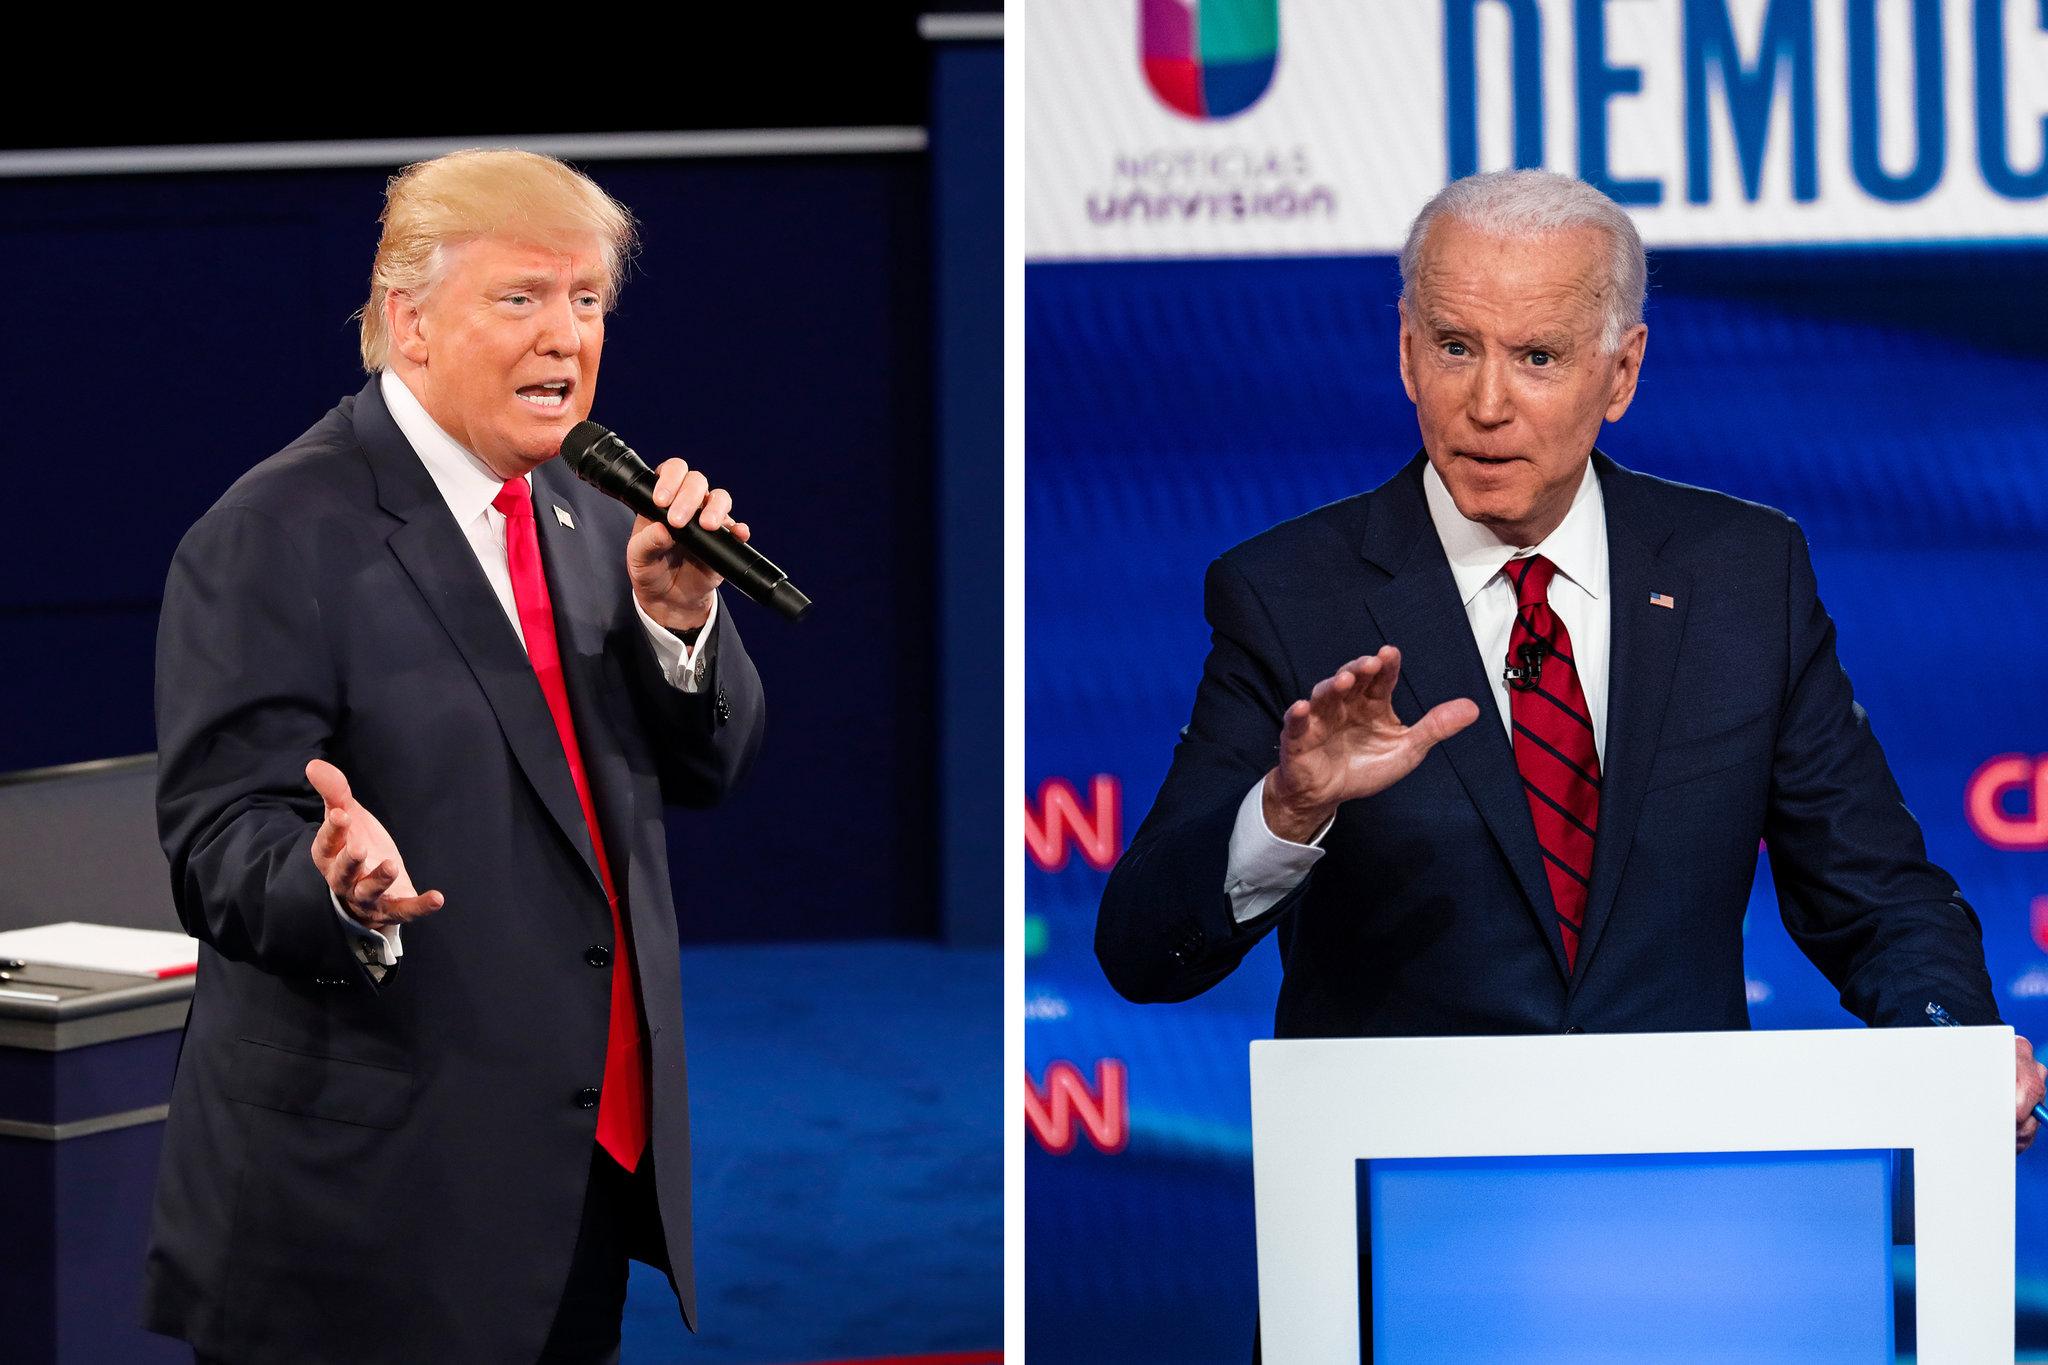 Raih 44 Electoral Votes, Biden Sementara Unggul dari Trump Image'